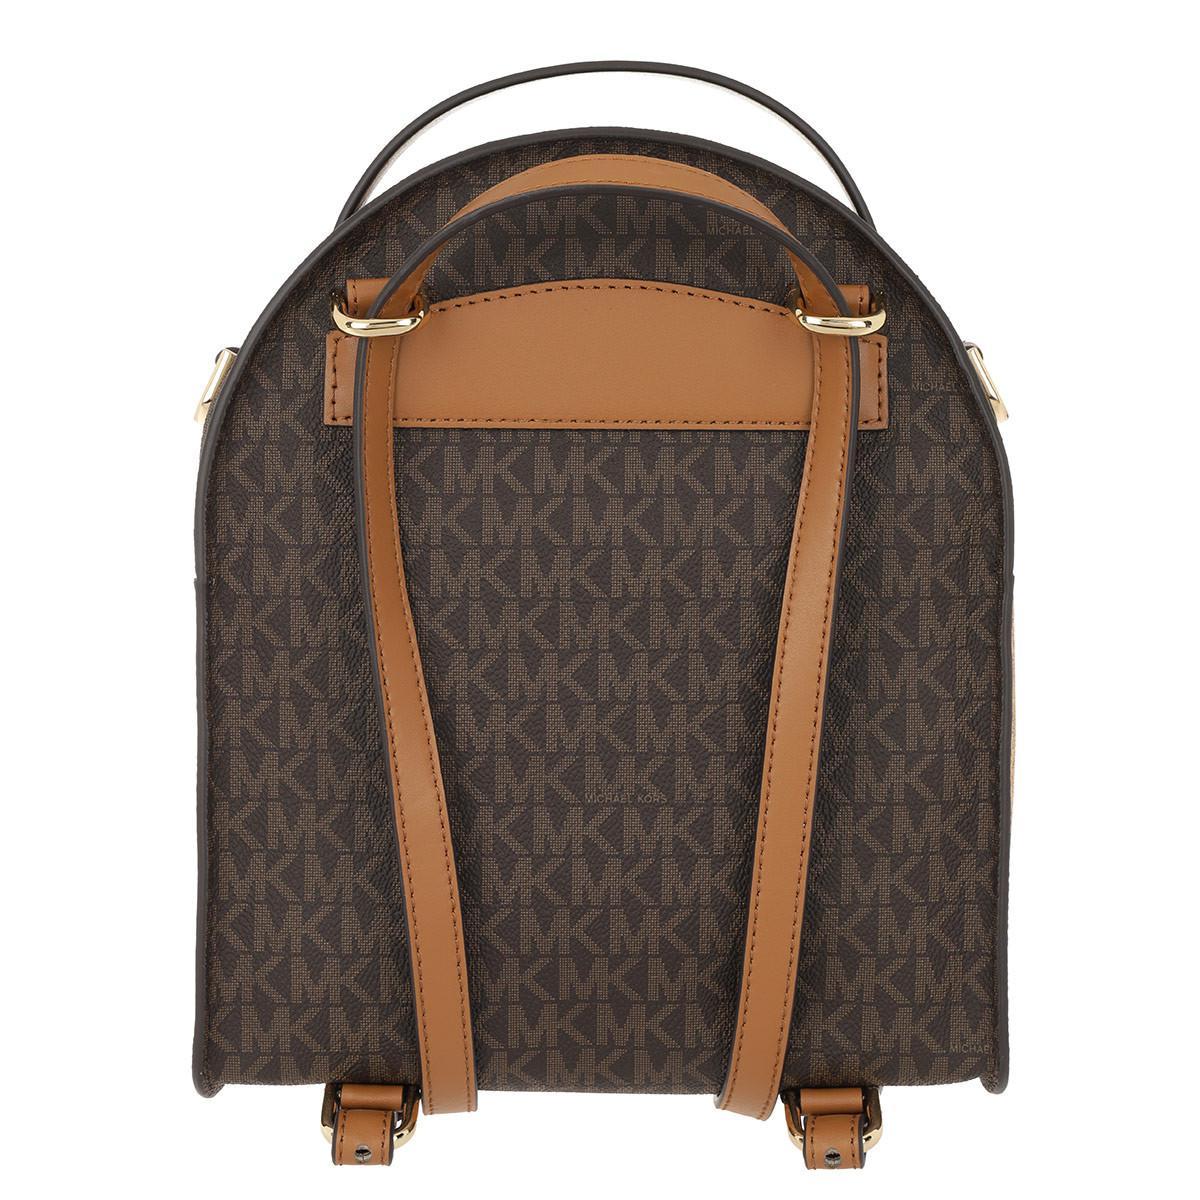 375ec0b9b8a766 Michael Kors Jessa Sm Convertible Backpack Brn/btrn/acr in Brown - Lyst